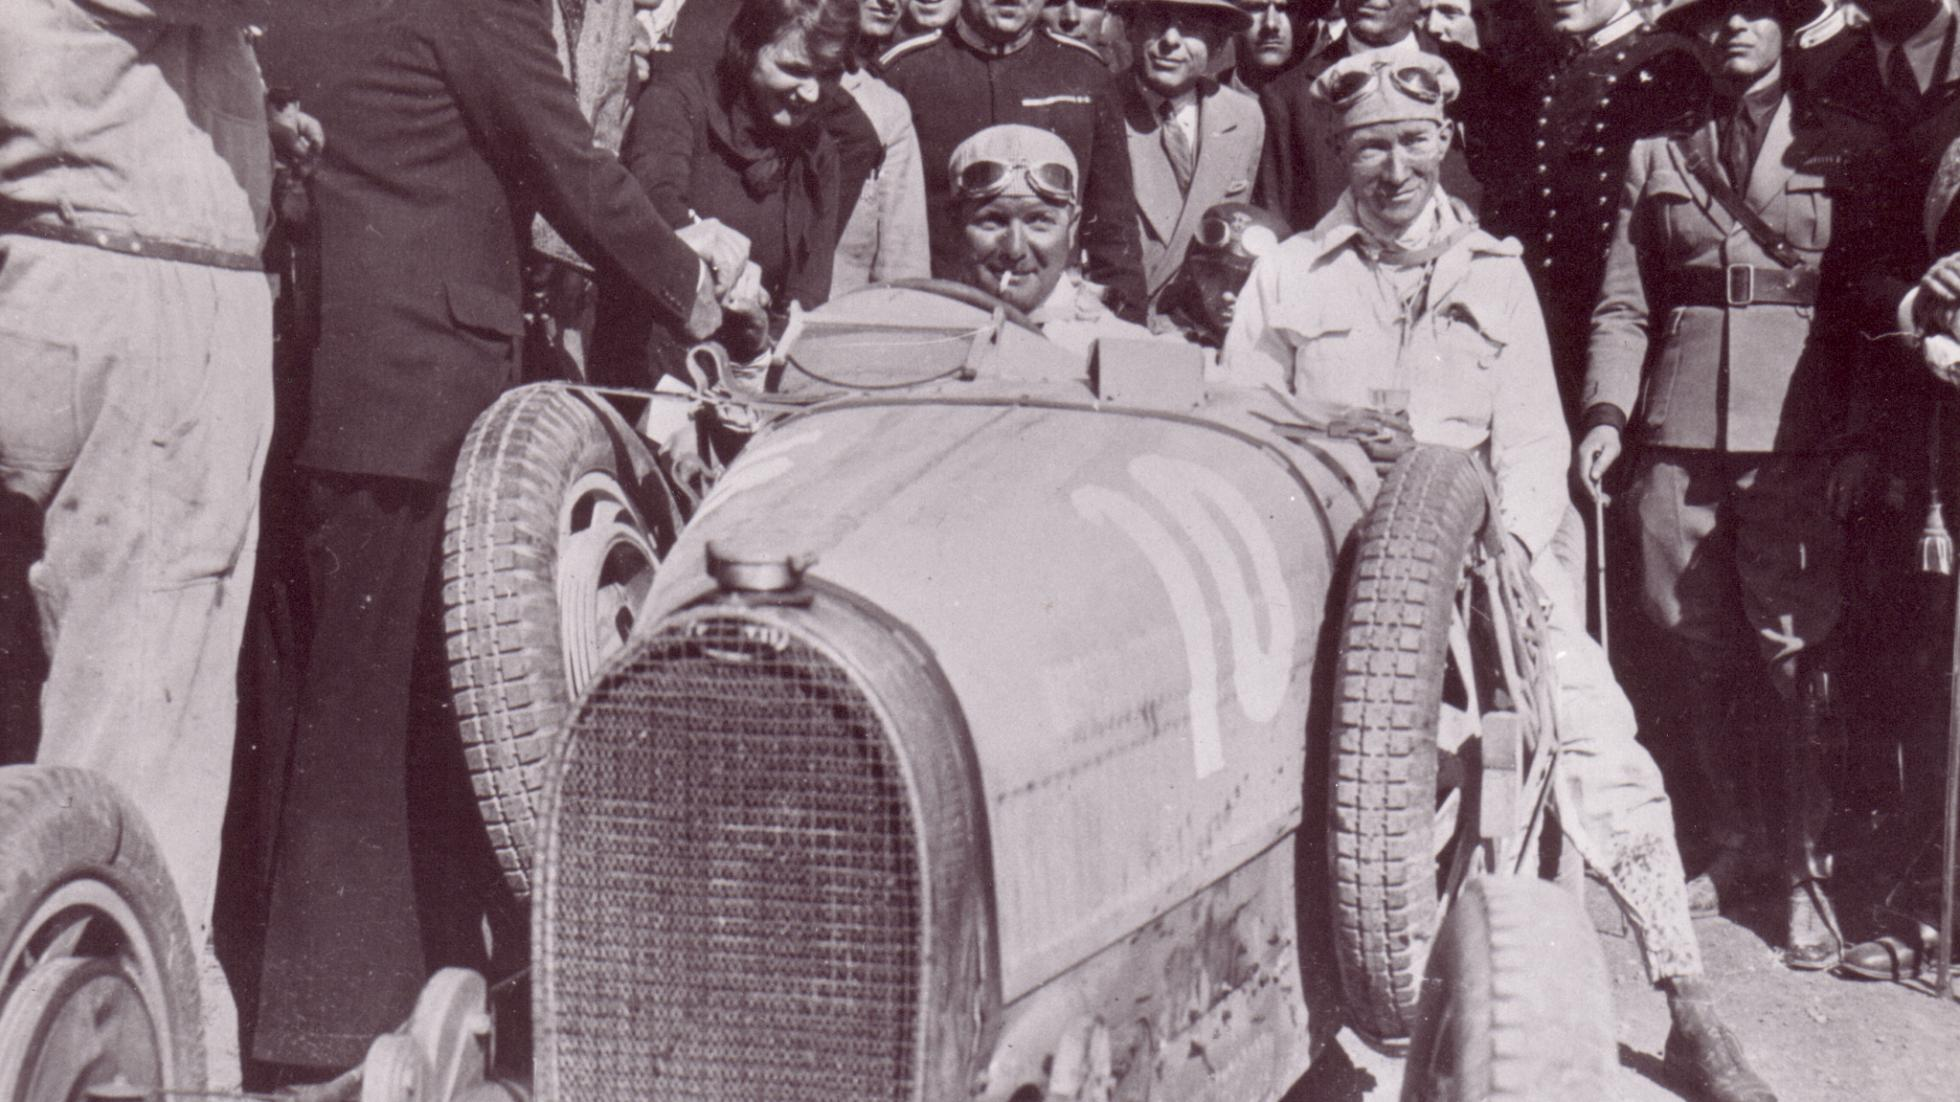 Ganó dos veces la Targa Florio